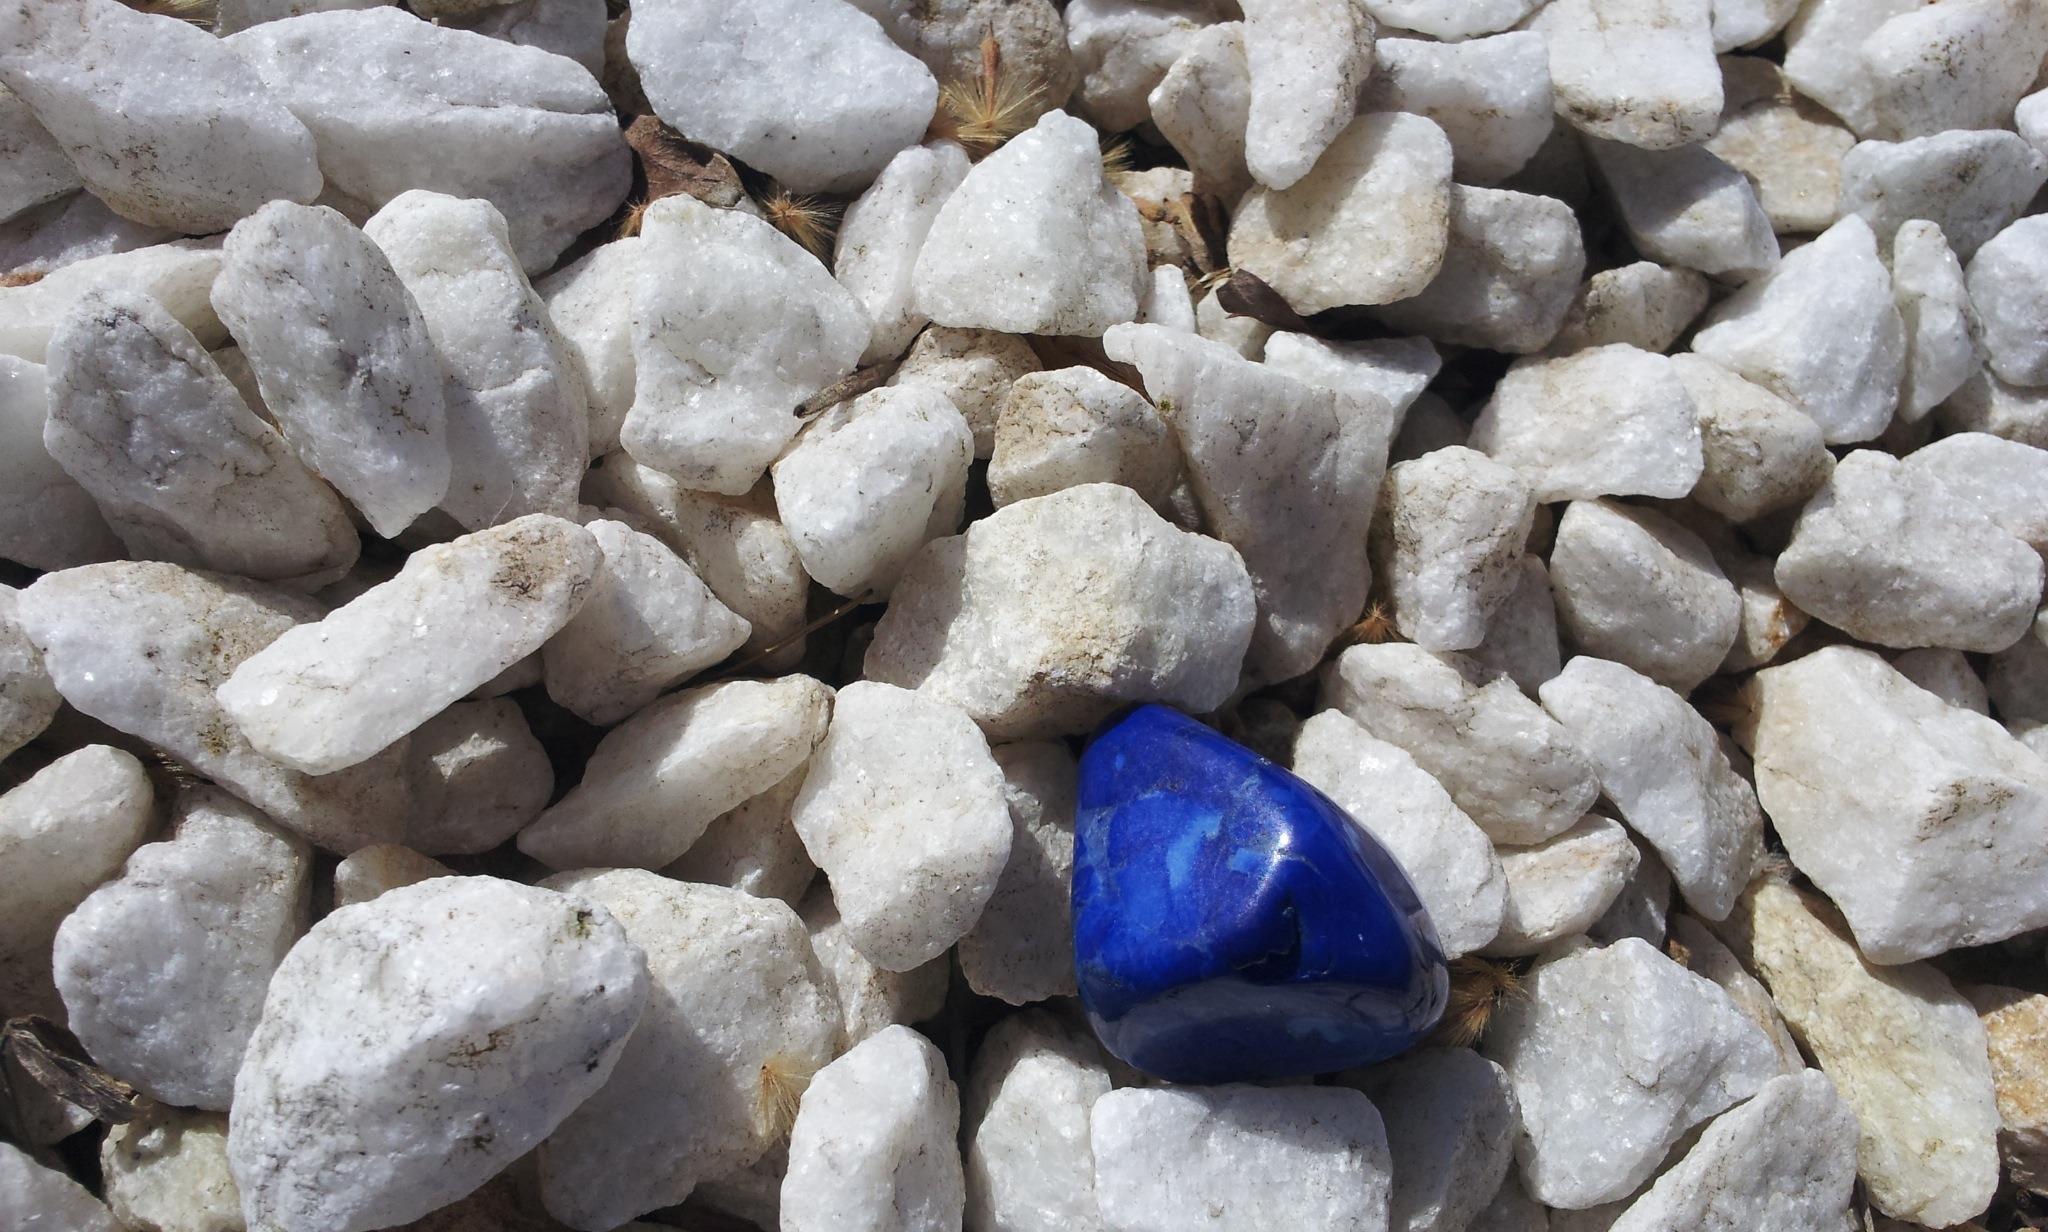 rock-petal-stone-pebble-blue-material-1351736-pxhere.com